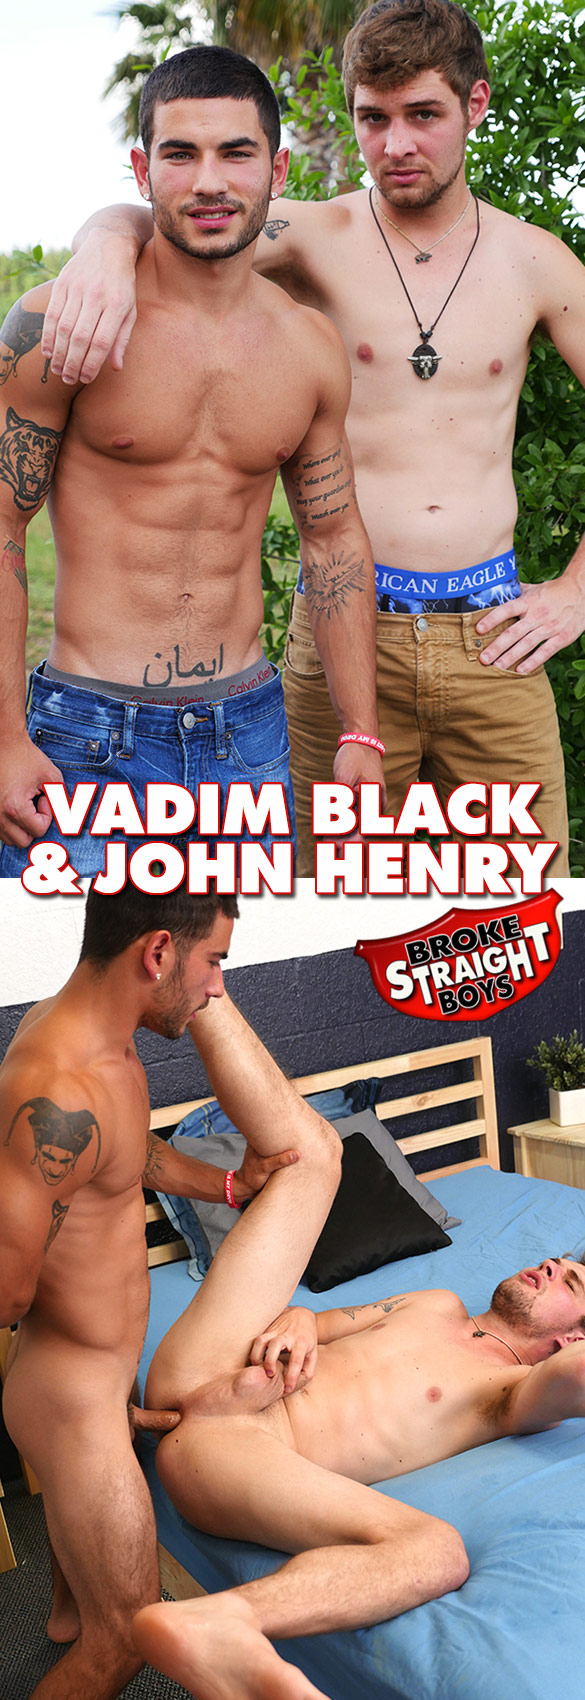 Broke Straight Boys: Vadim Black fucks John Henry raw